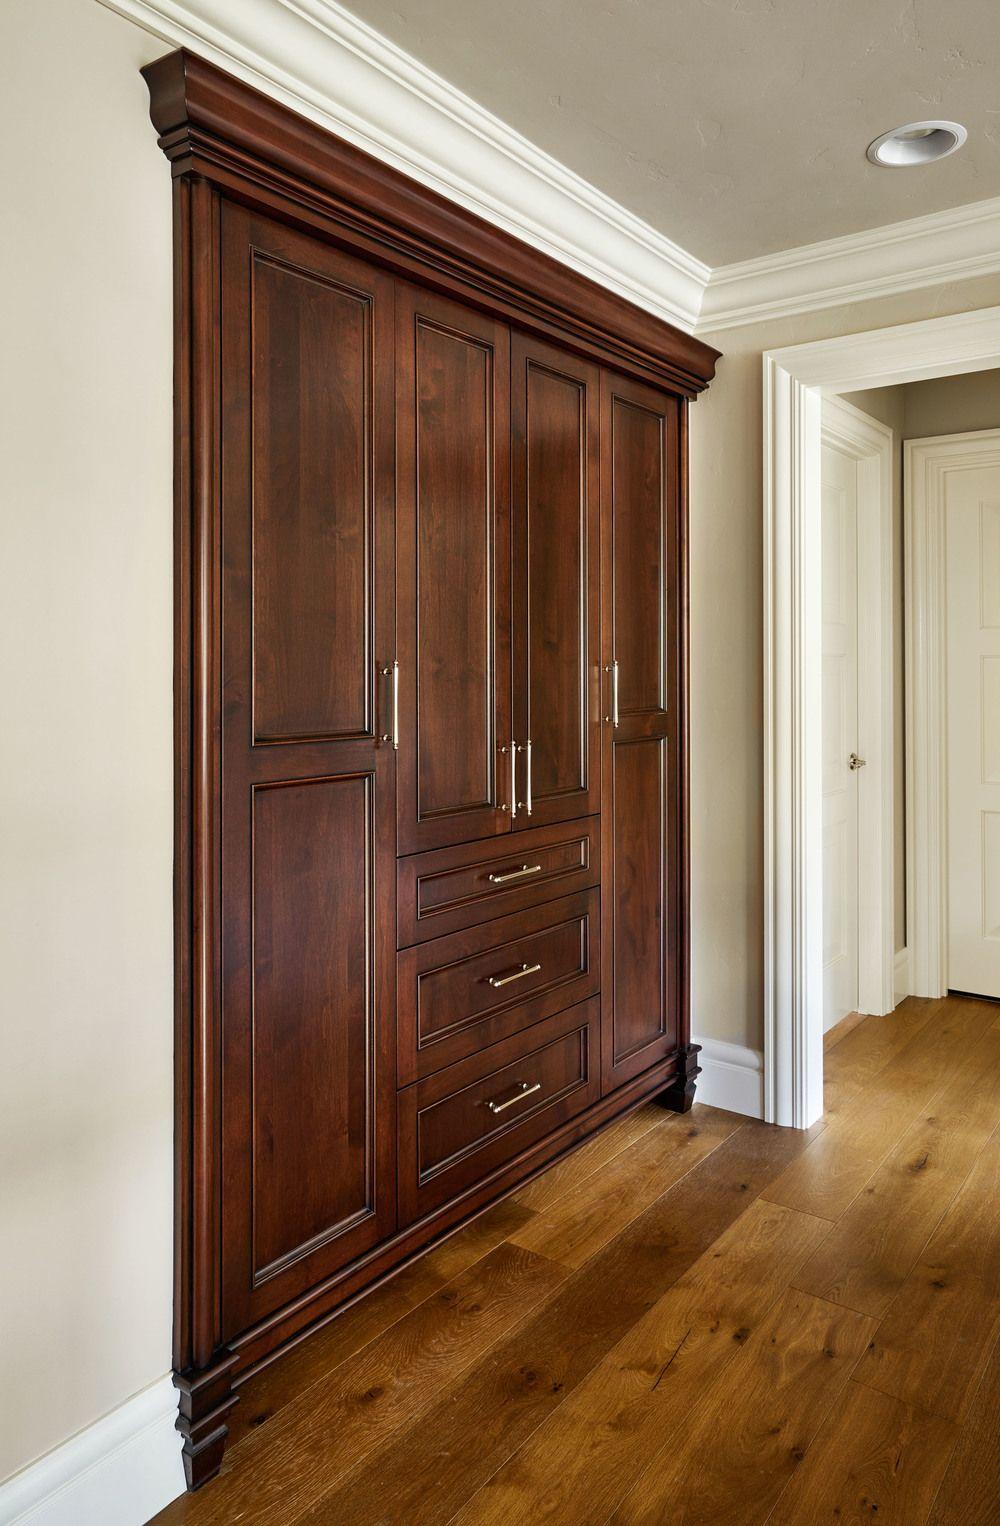 Hallway storage cabinet  Garrison Hullinger  Adeline built in  Interior  Pinterest  Home